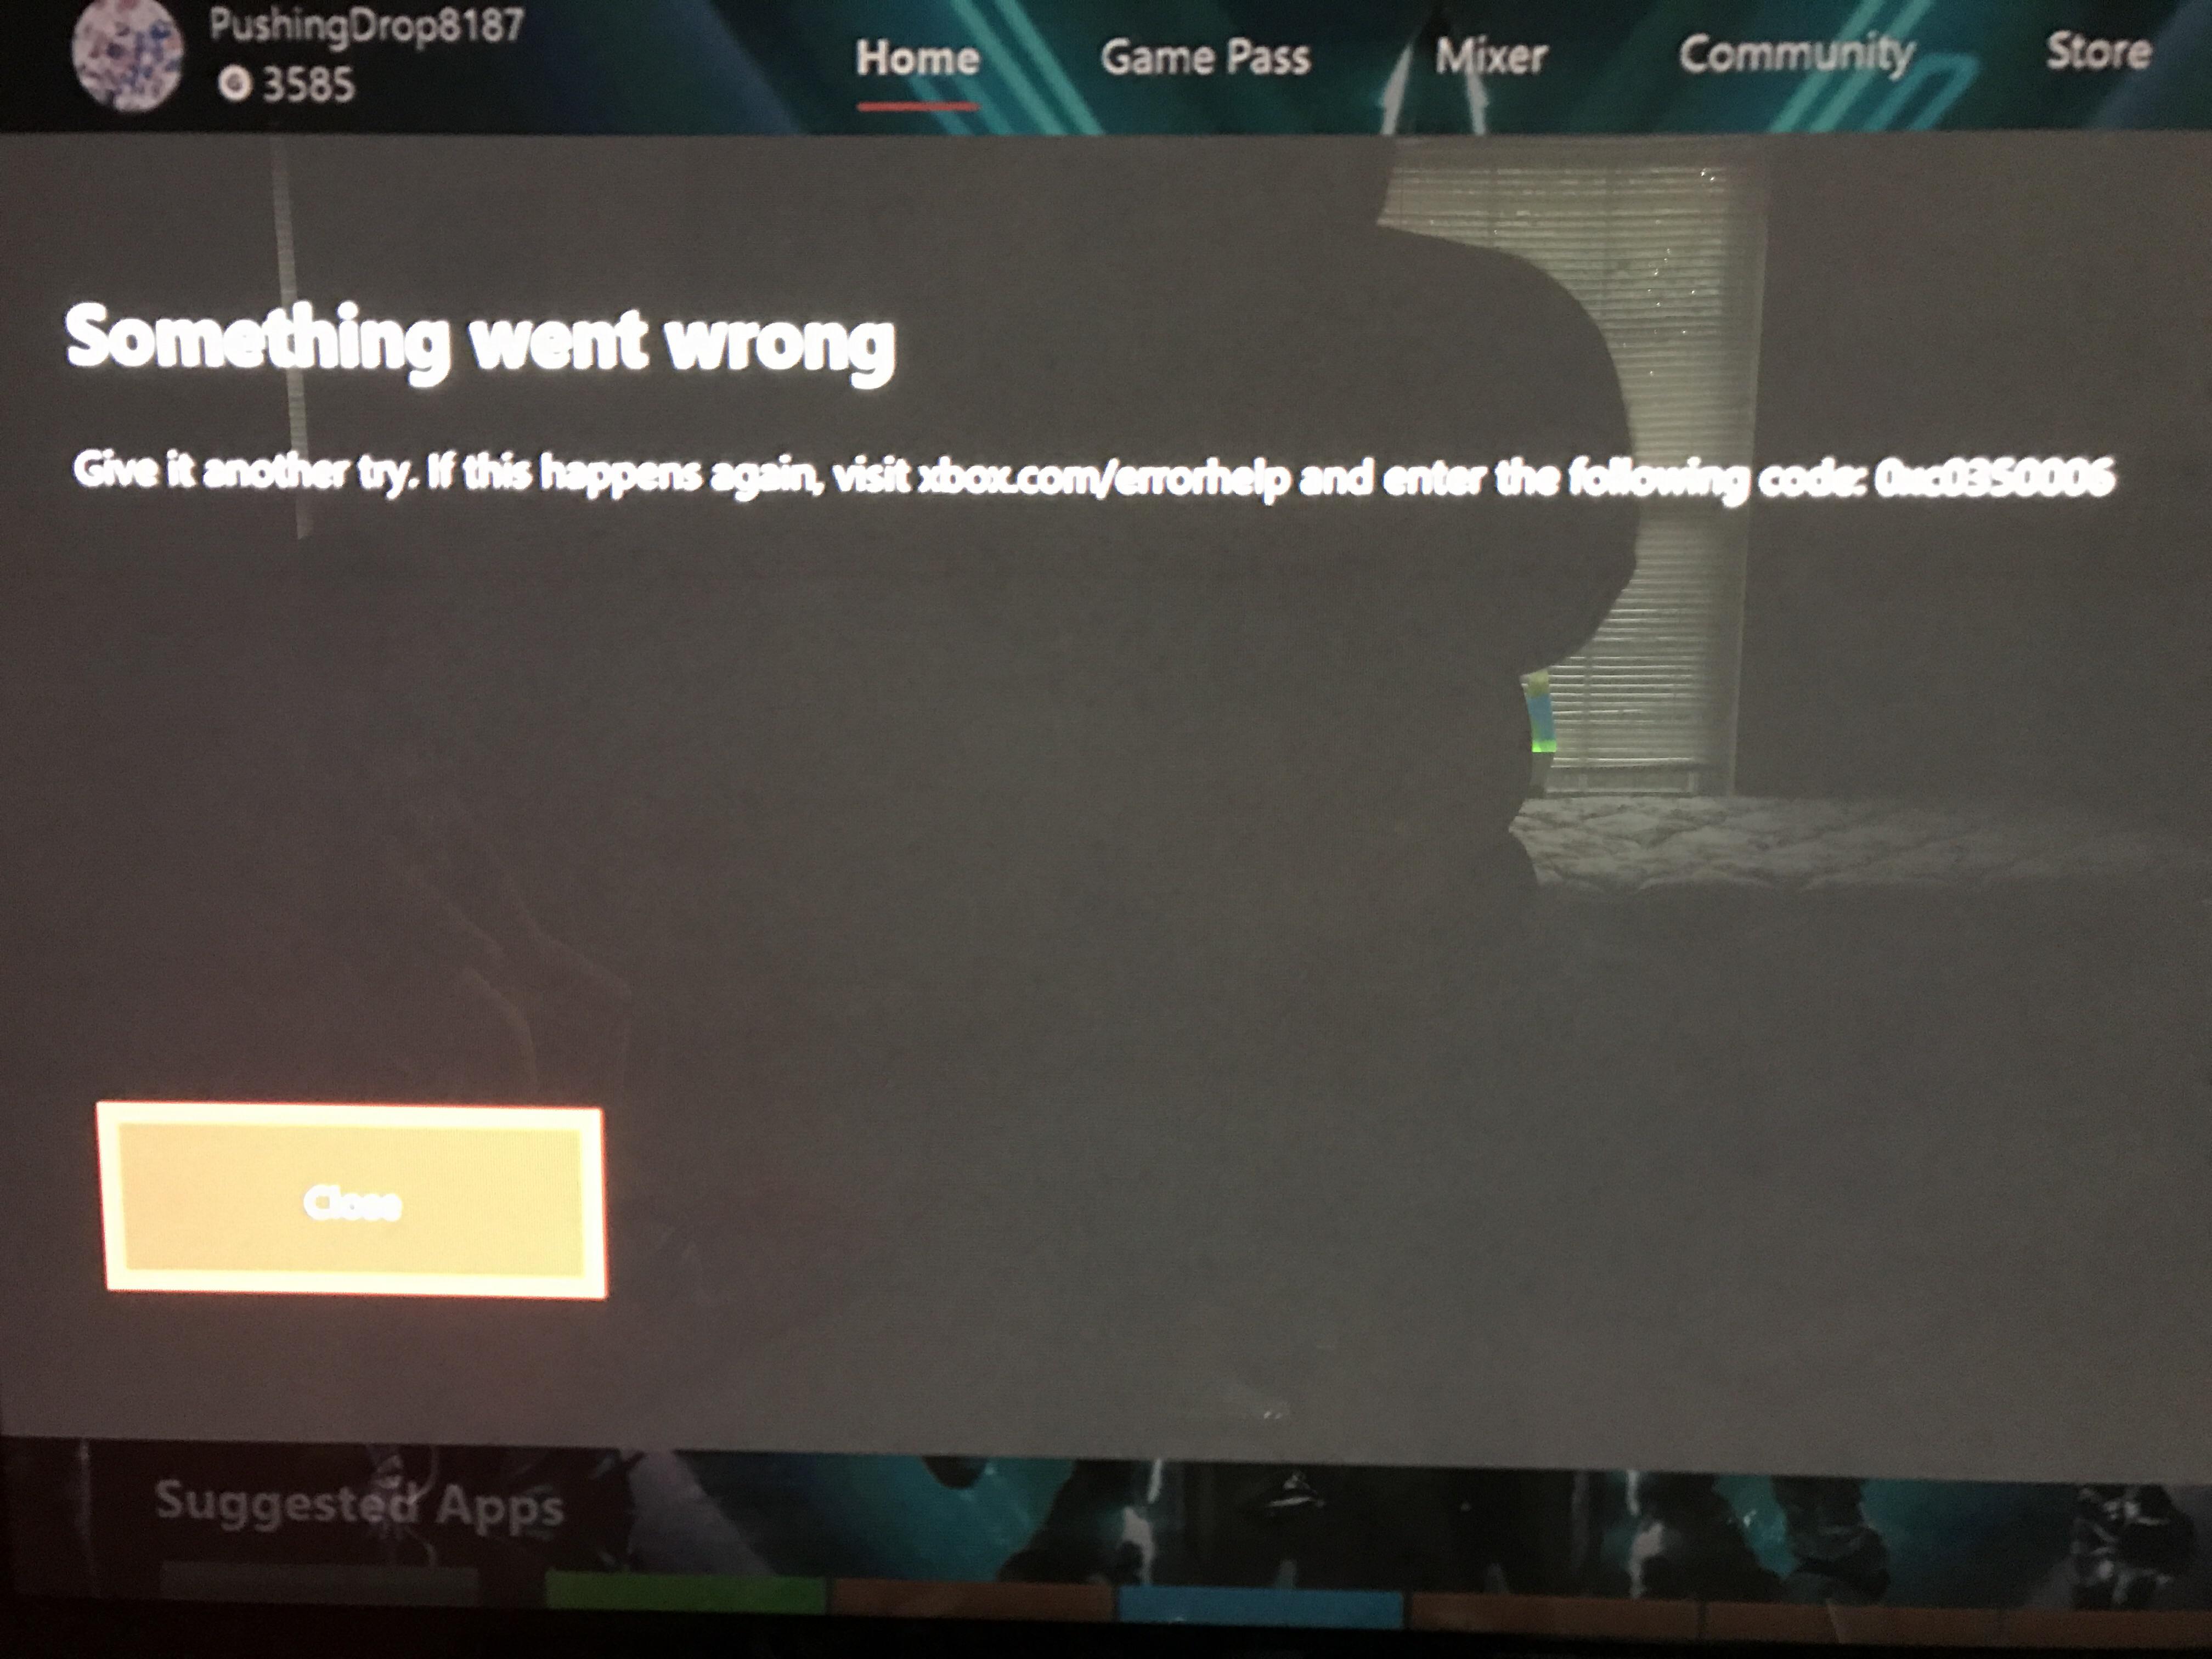 Something went wrong [IMG]